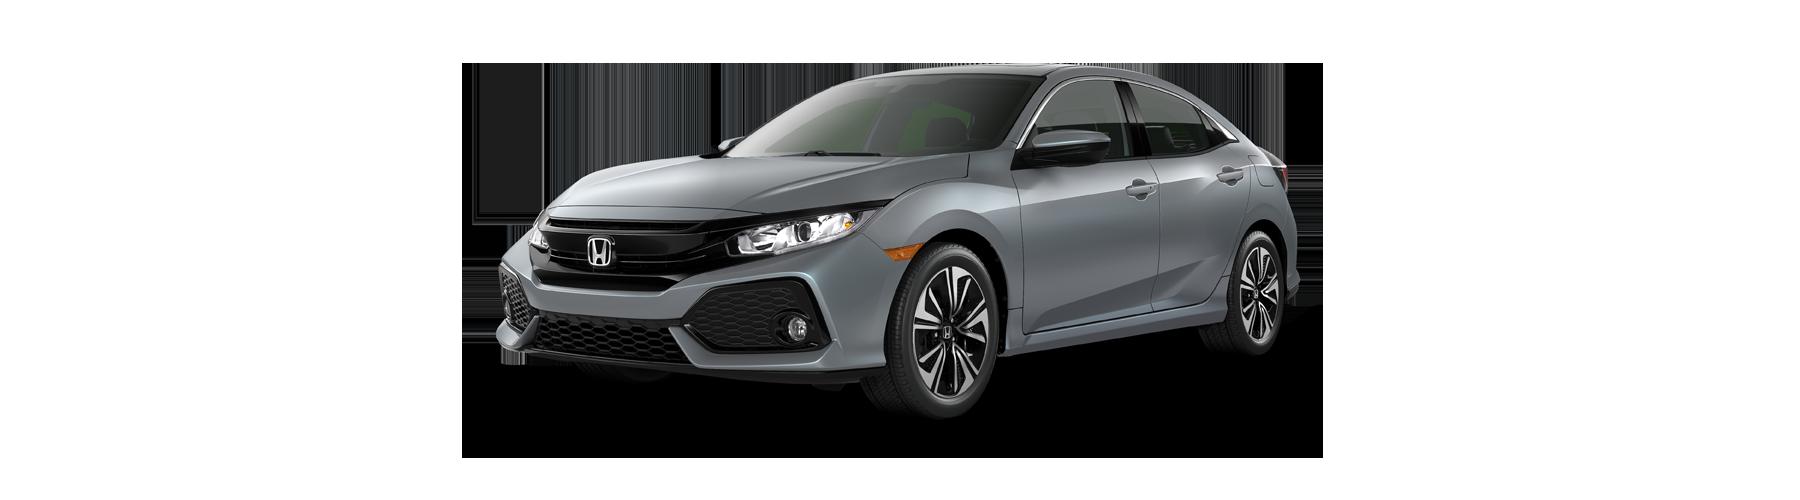 2017 Honda Civic Hatchback Front Angle